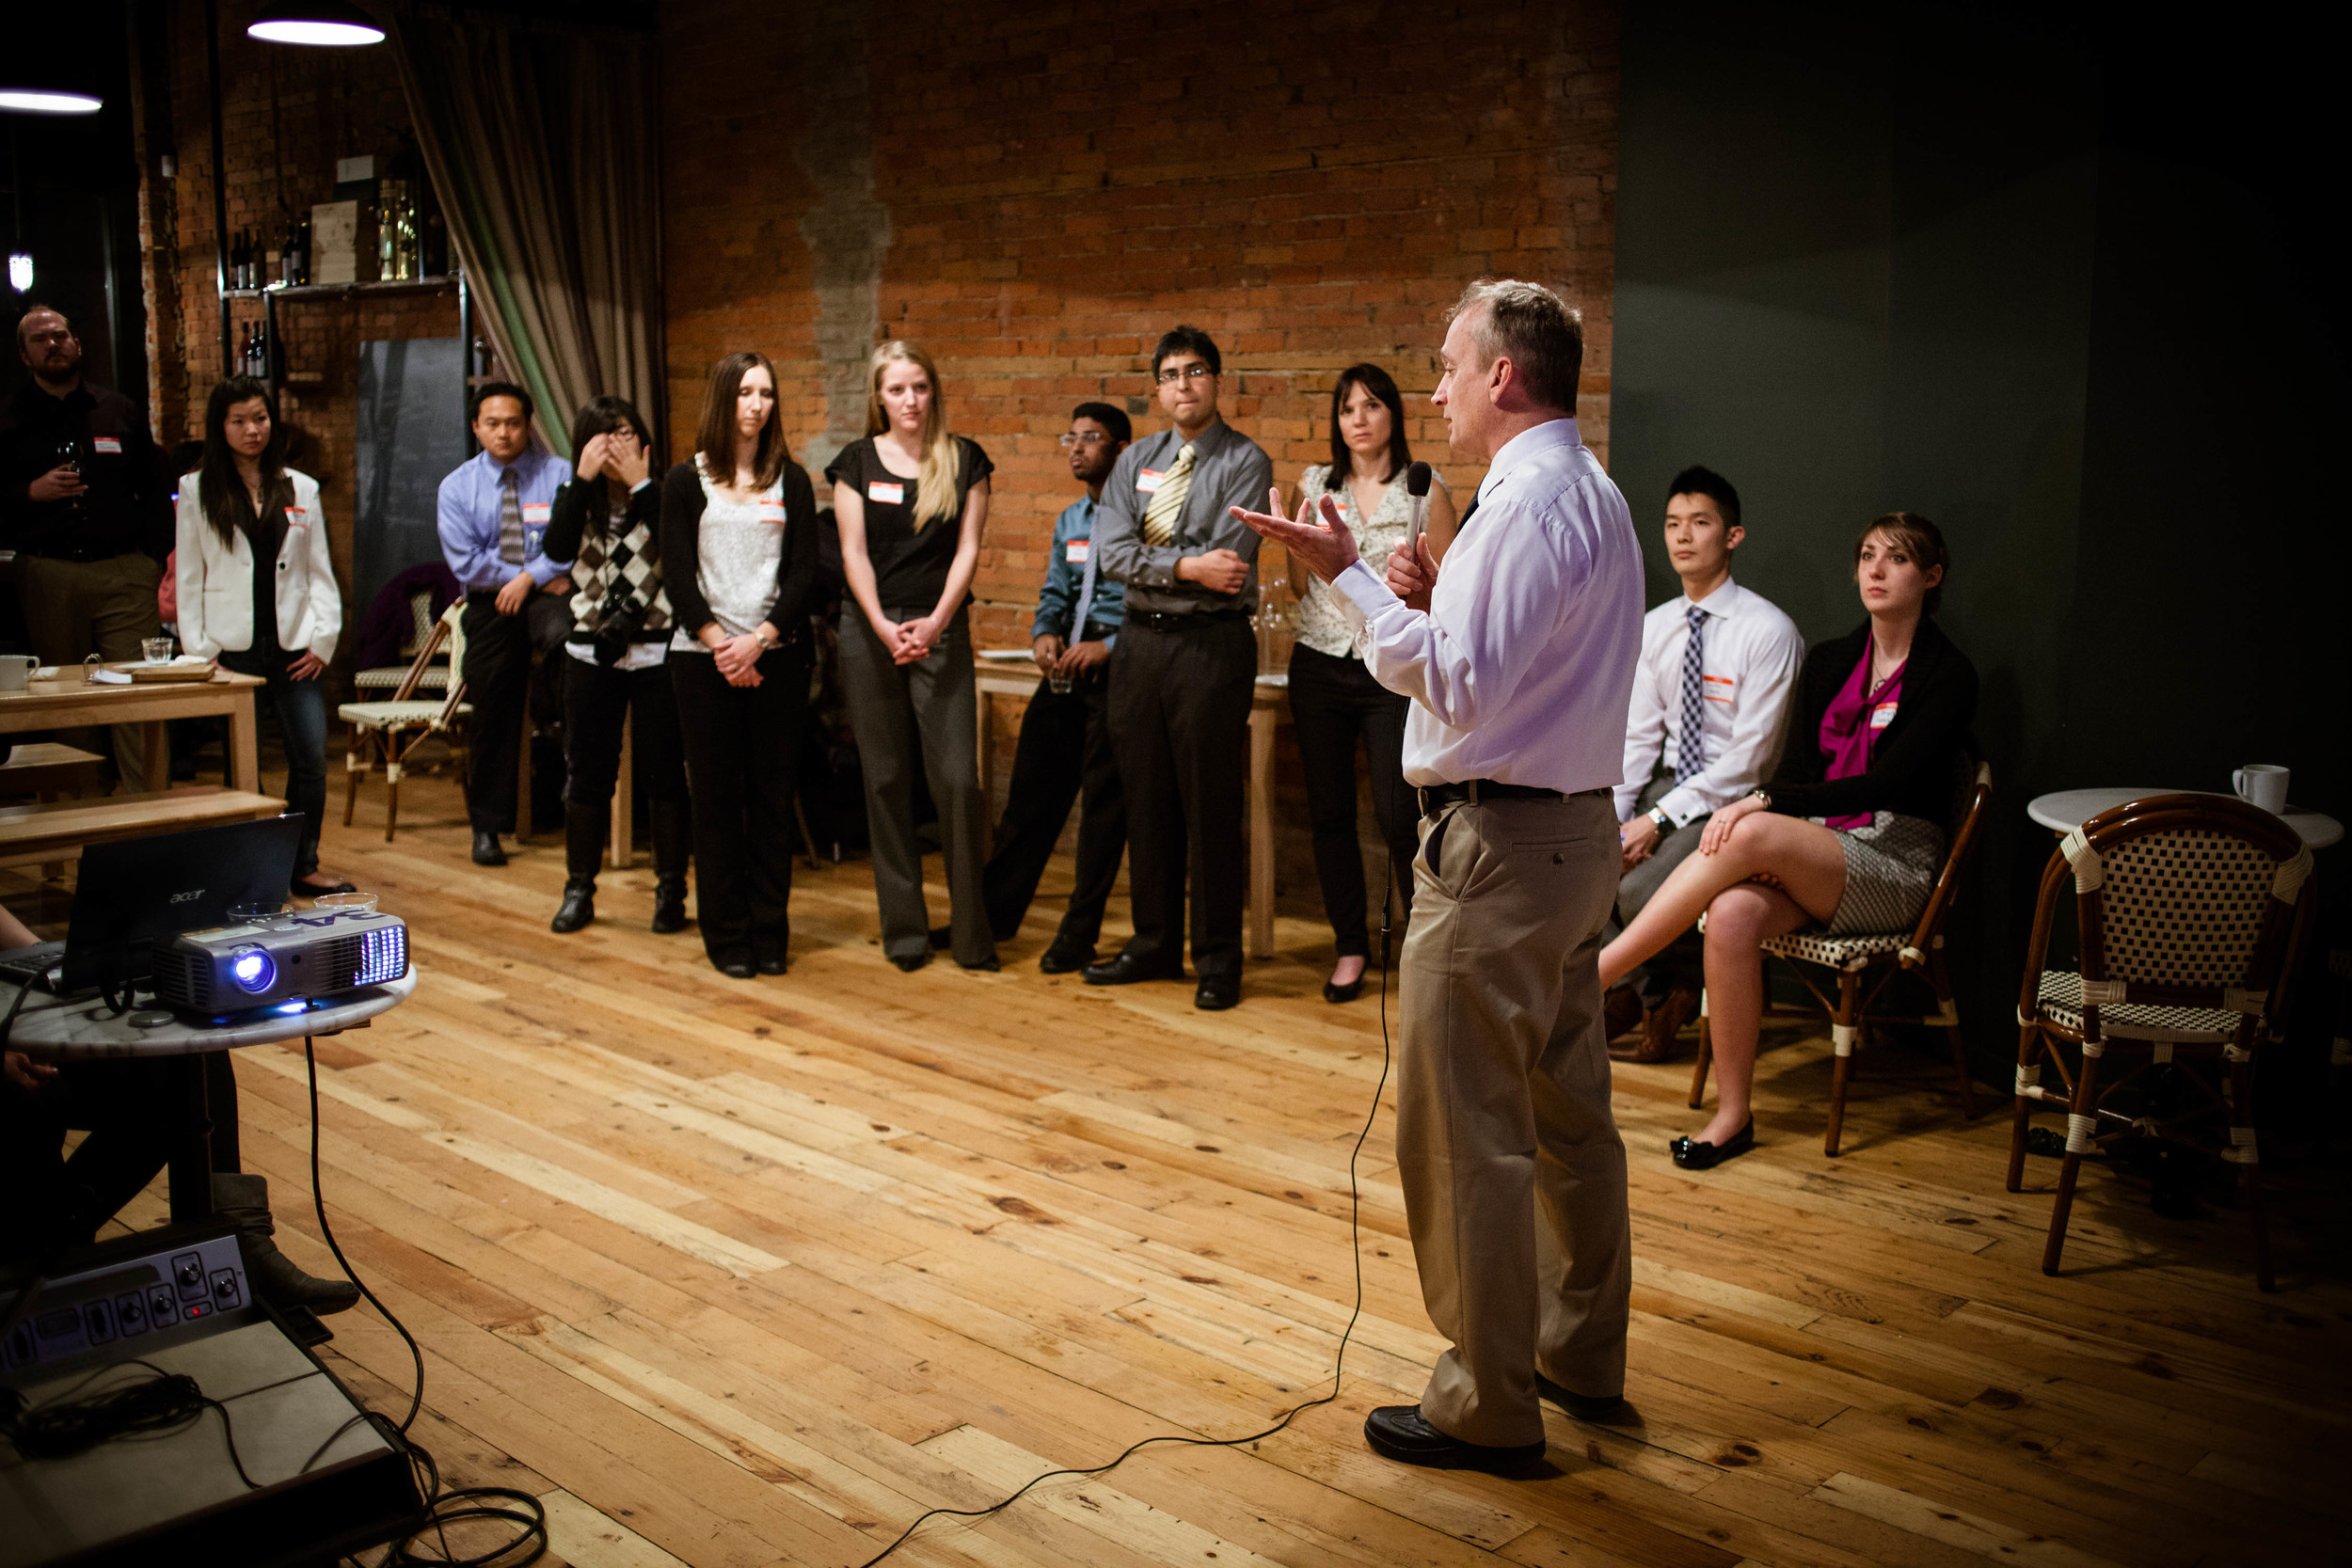 Street Medicine Institute Founder Inspires Medical Students (WSUSOM E-News) - Jan 10, 2013